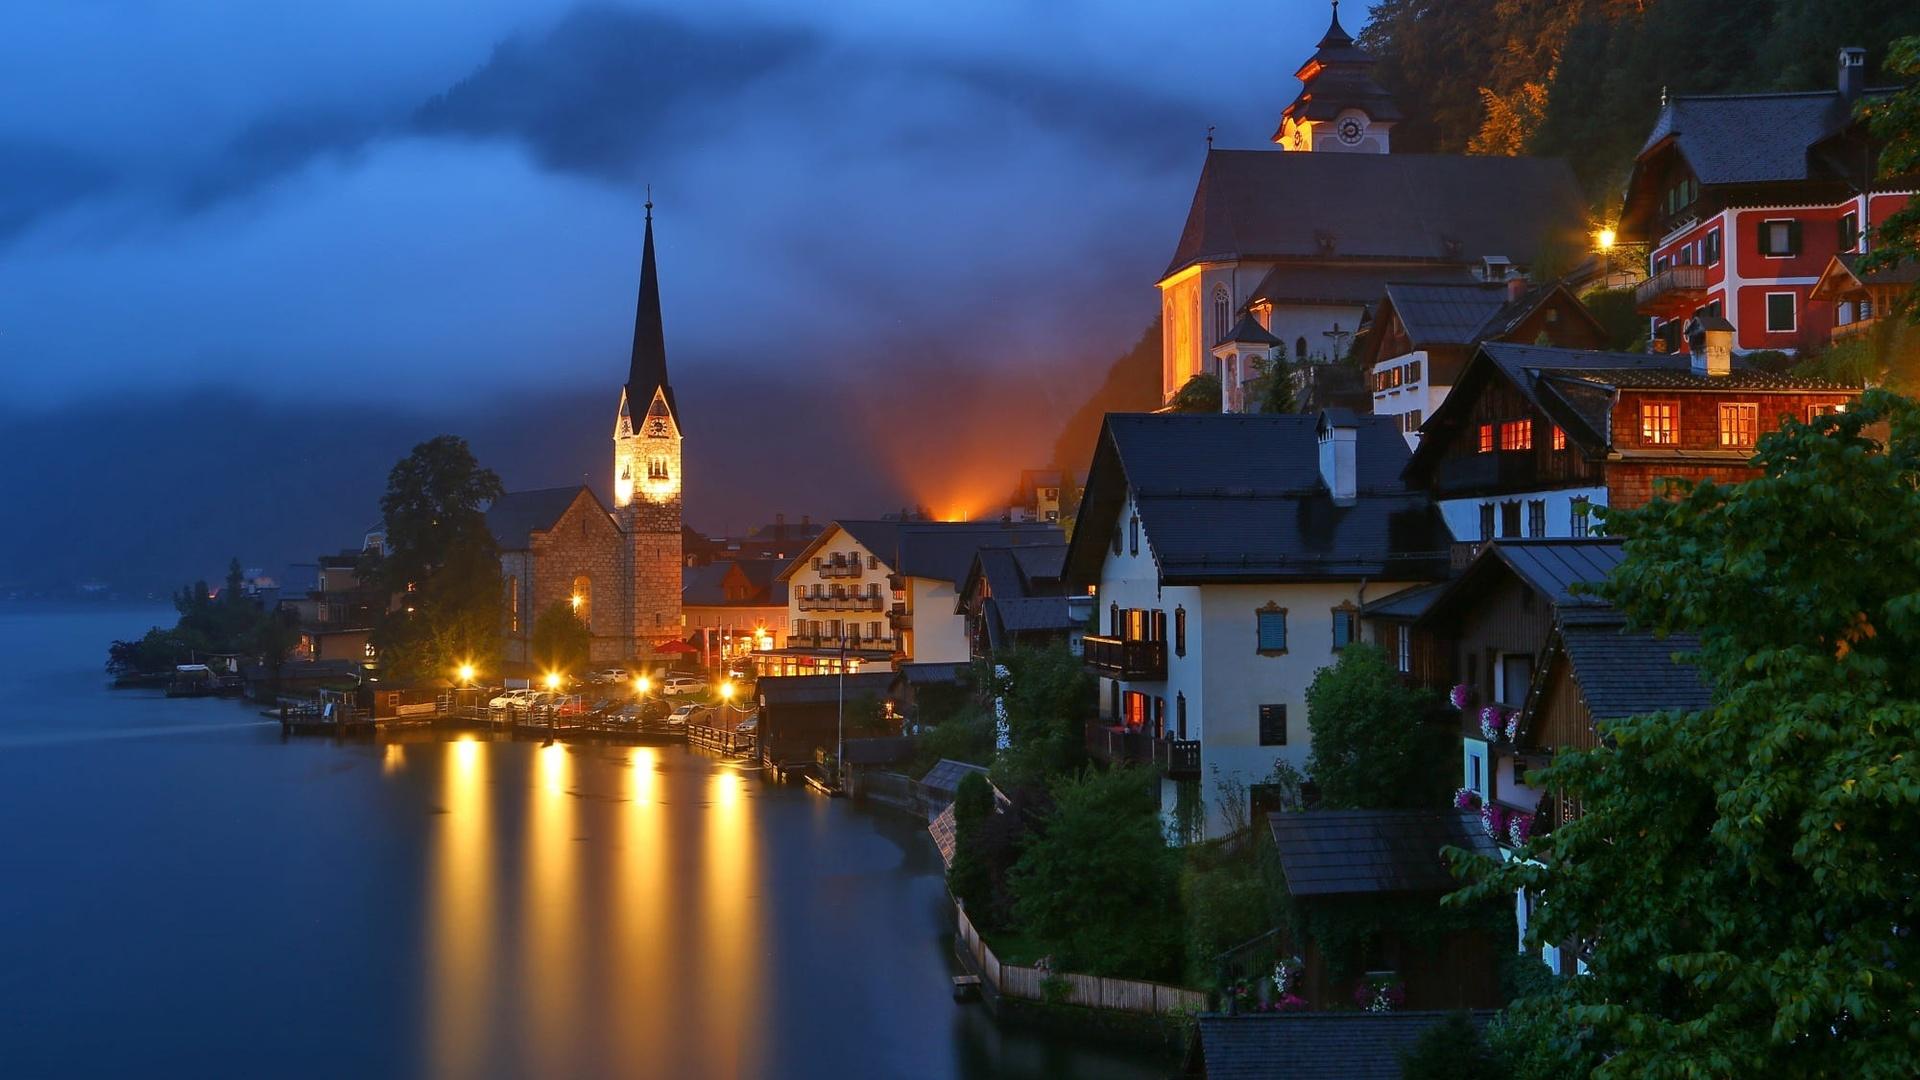 hallstatt, austria, гальштат, австрия, горы, городок